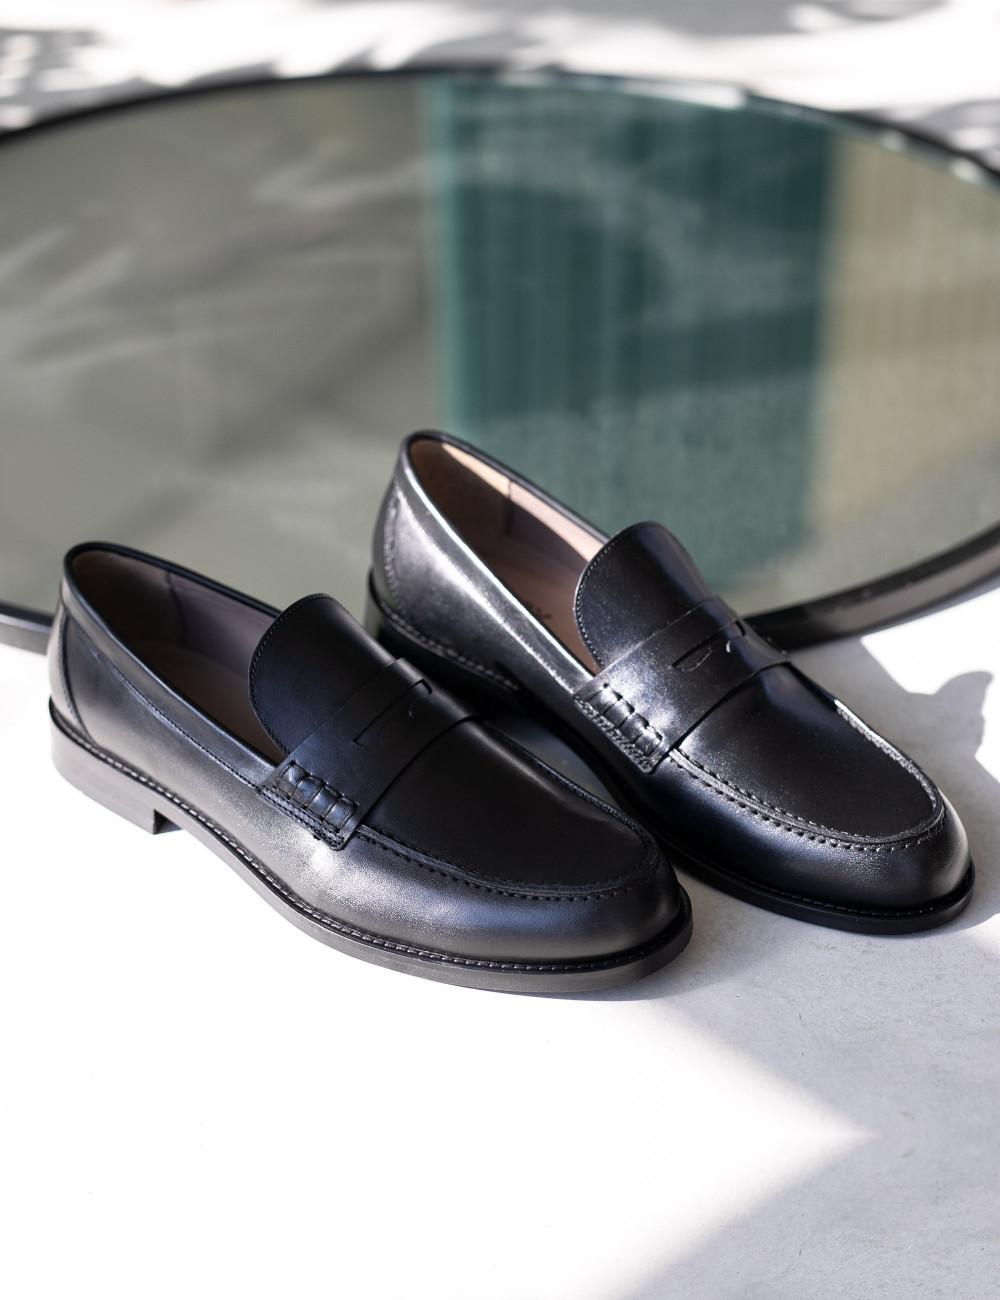 Hakiki Deri Siyah Loafer Erkek Ayakkabı - 01538MSYHM02